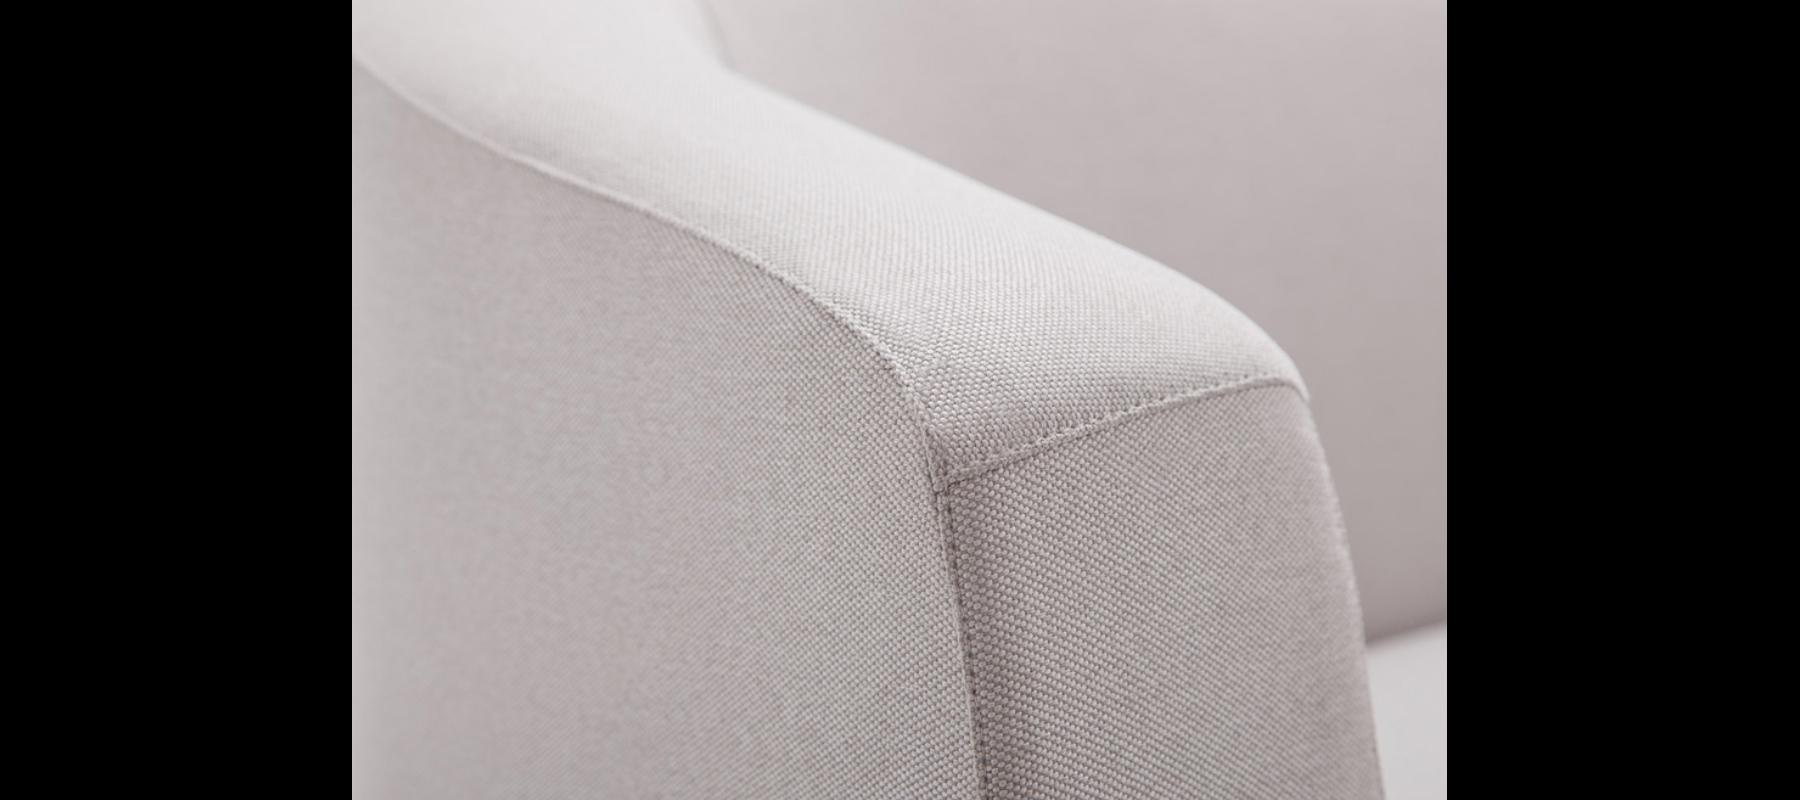 siedziska noble detale - 01